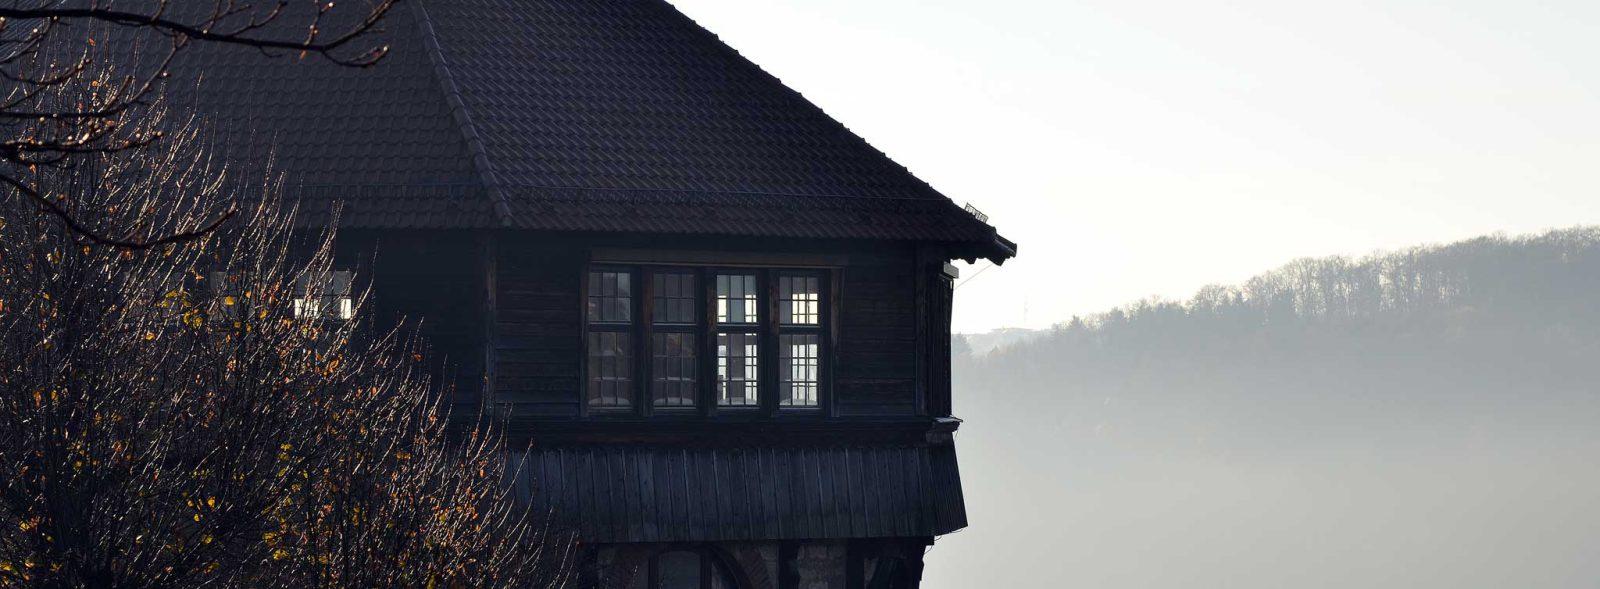 Dicker Turm Fenster